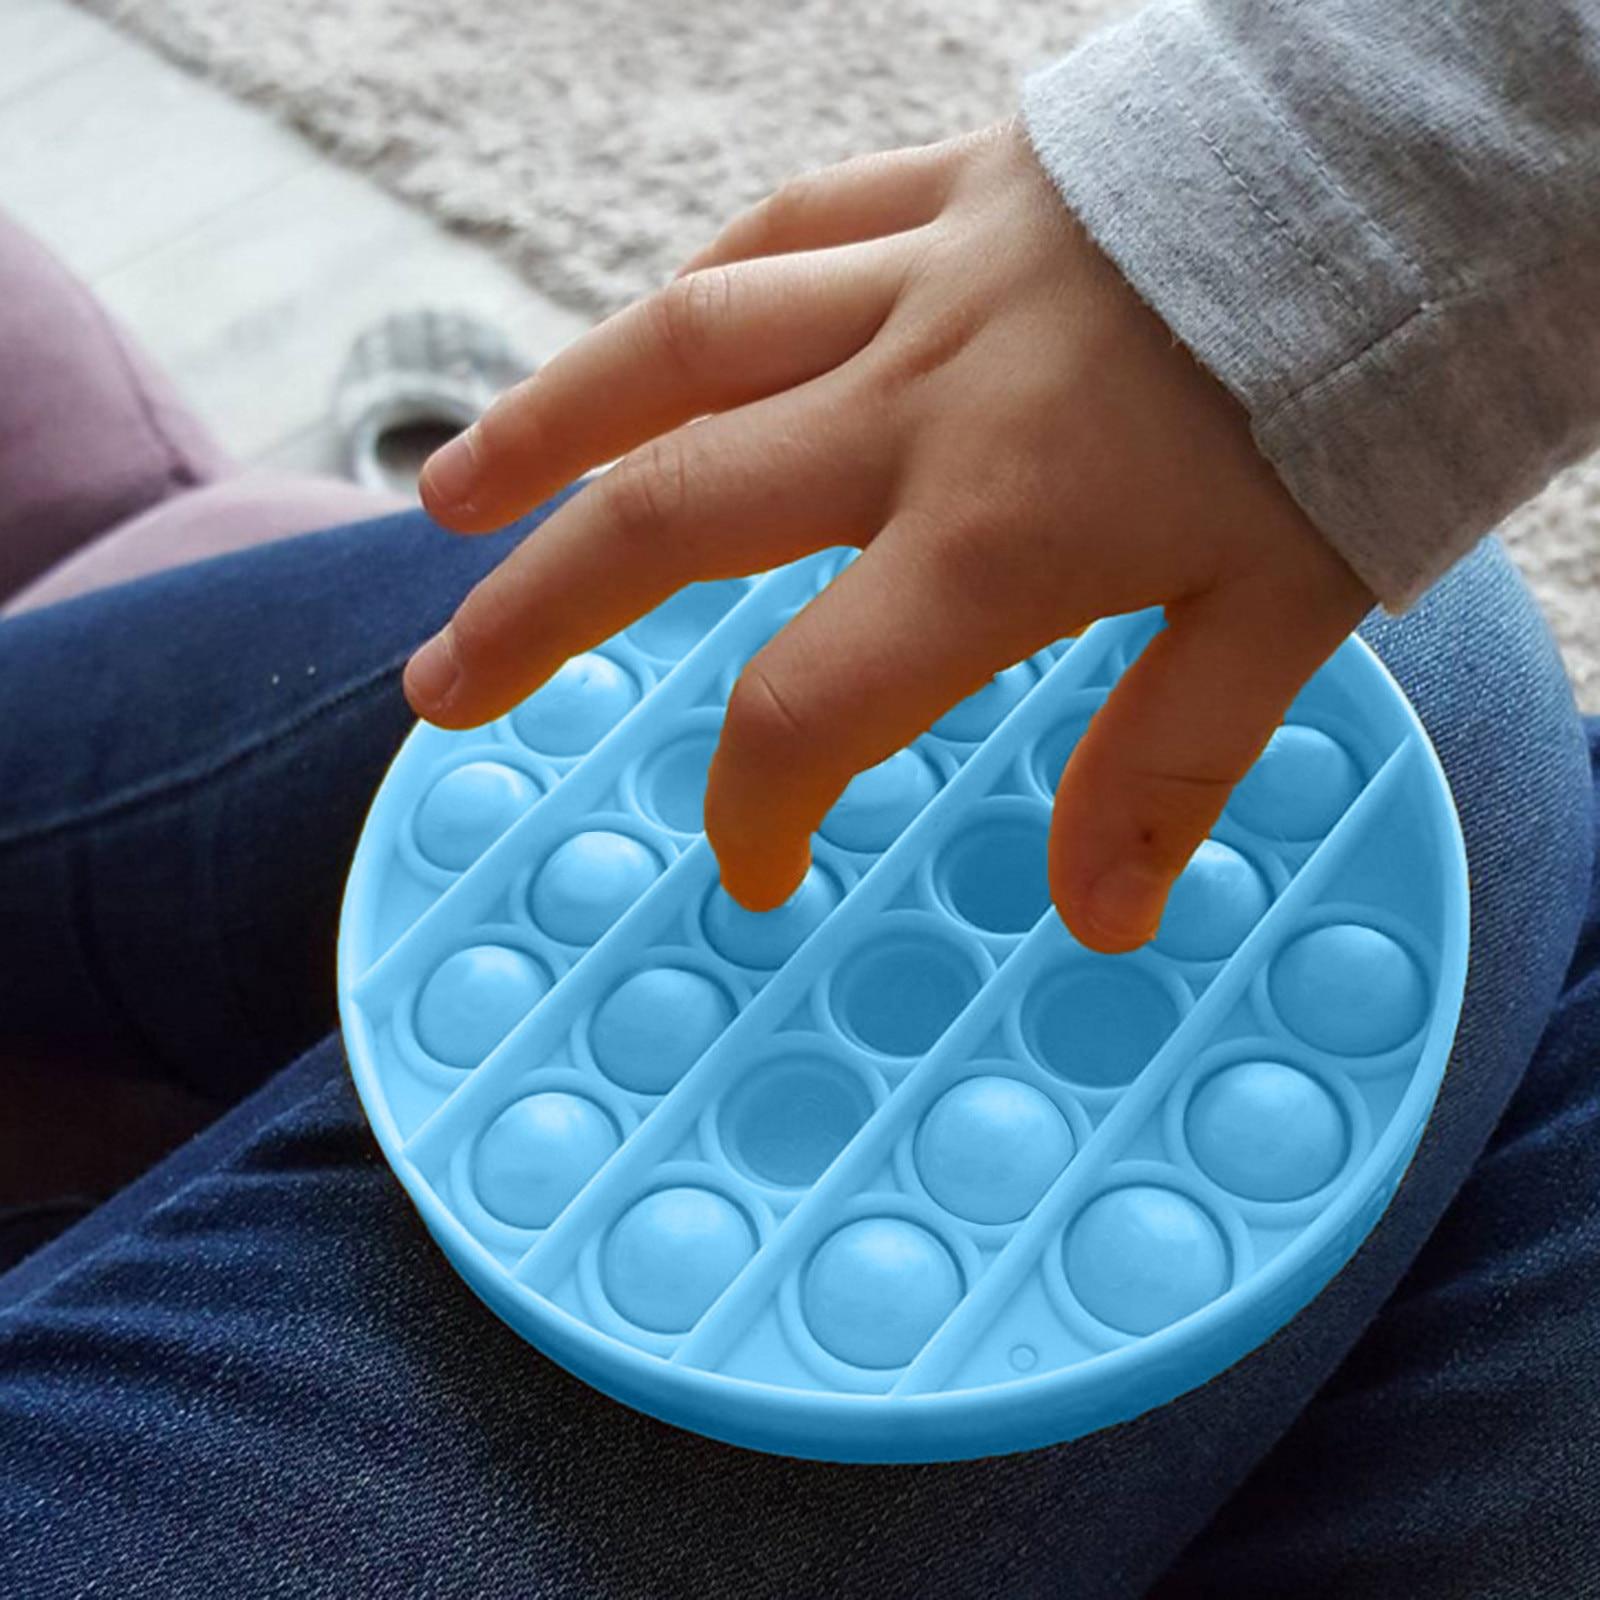 Fidget-Toys Autism Bubble-Sensory Stress Reliever Funny Squishy Push-Pops Needs Adult